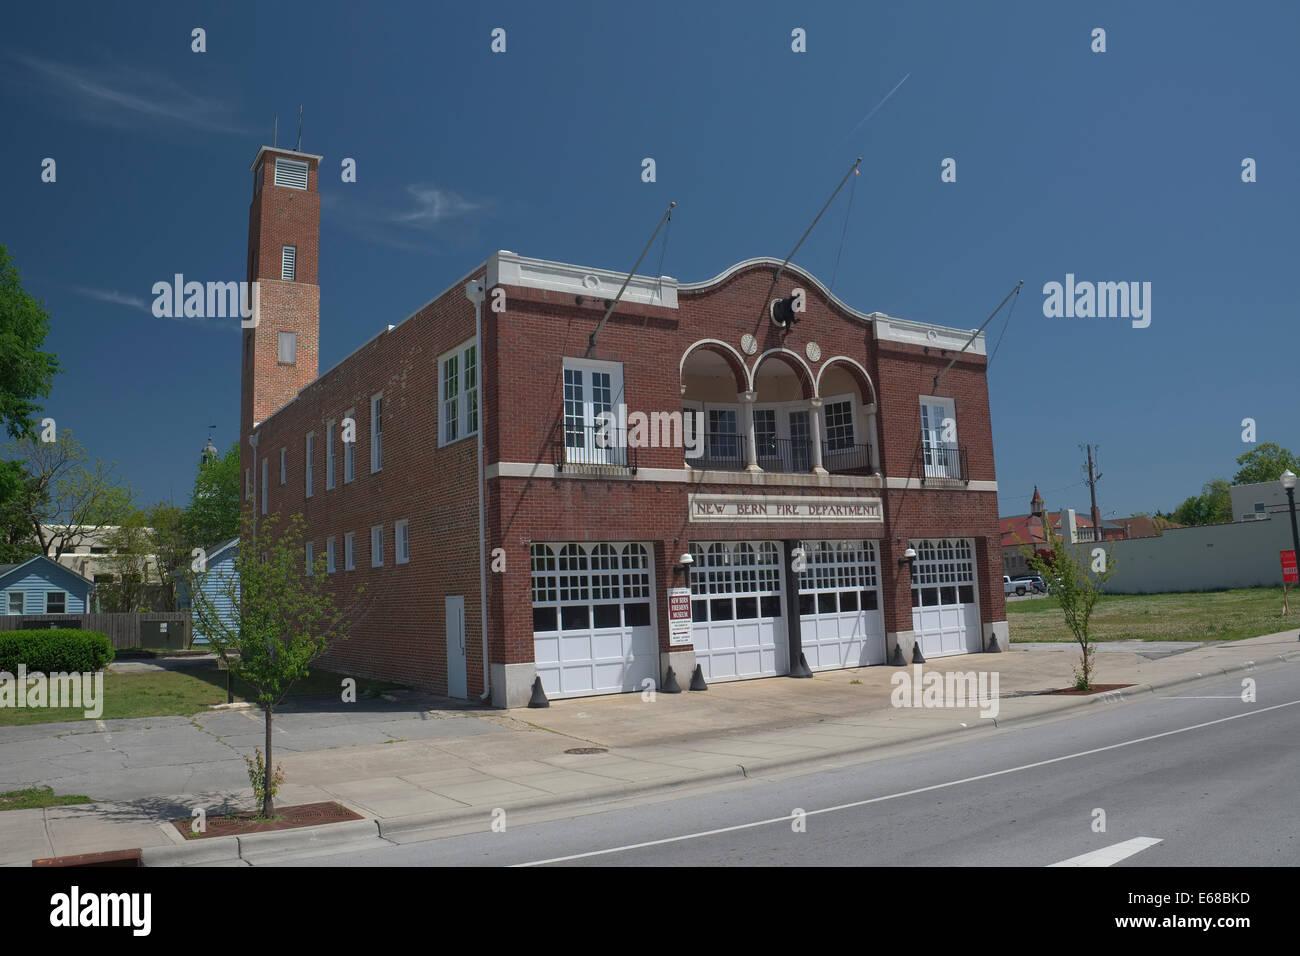 Old New Bern fire Department building on Broad Street. New Bern, North Carolina - Stock Image